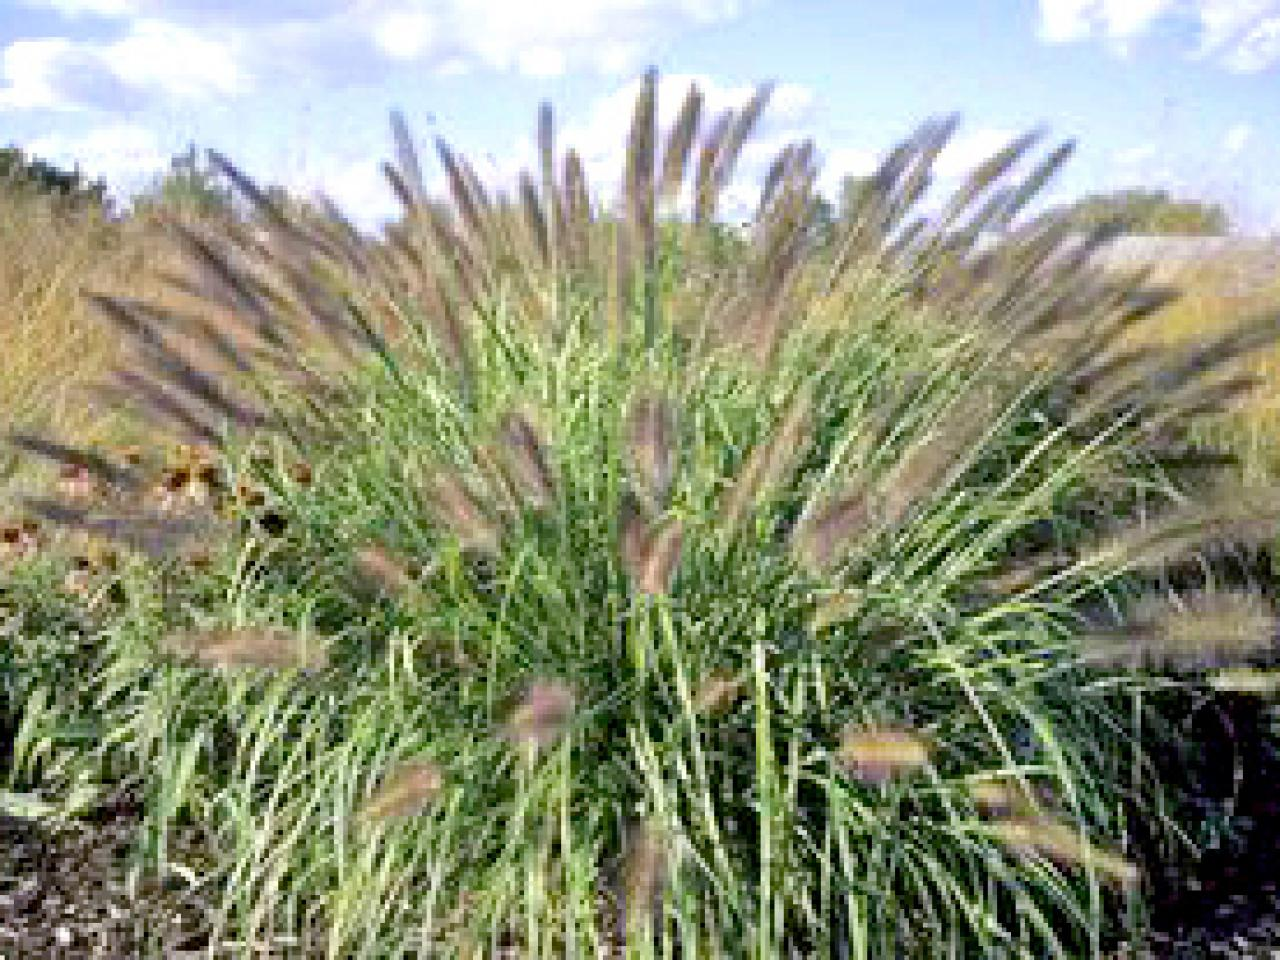 Types of ornamental grasses hgtv for Different grasses for landscaping